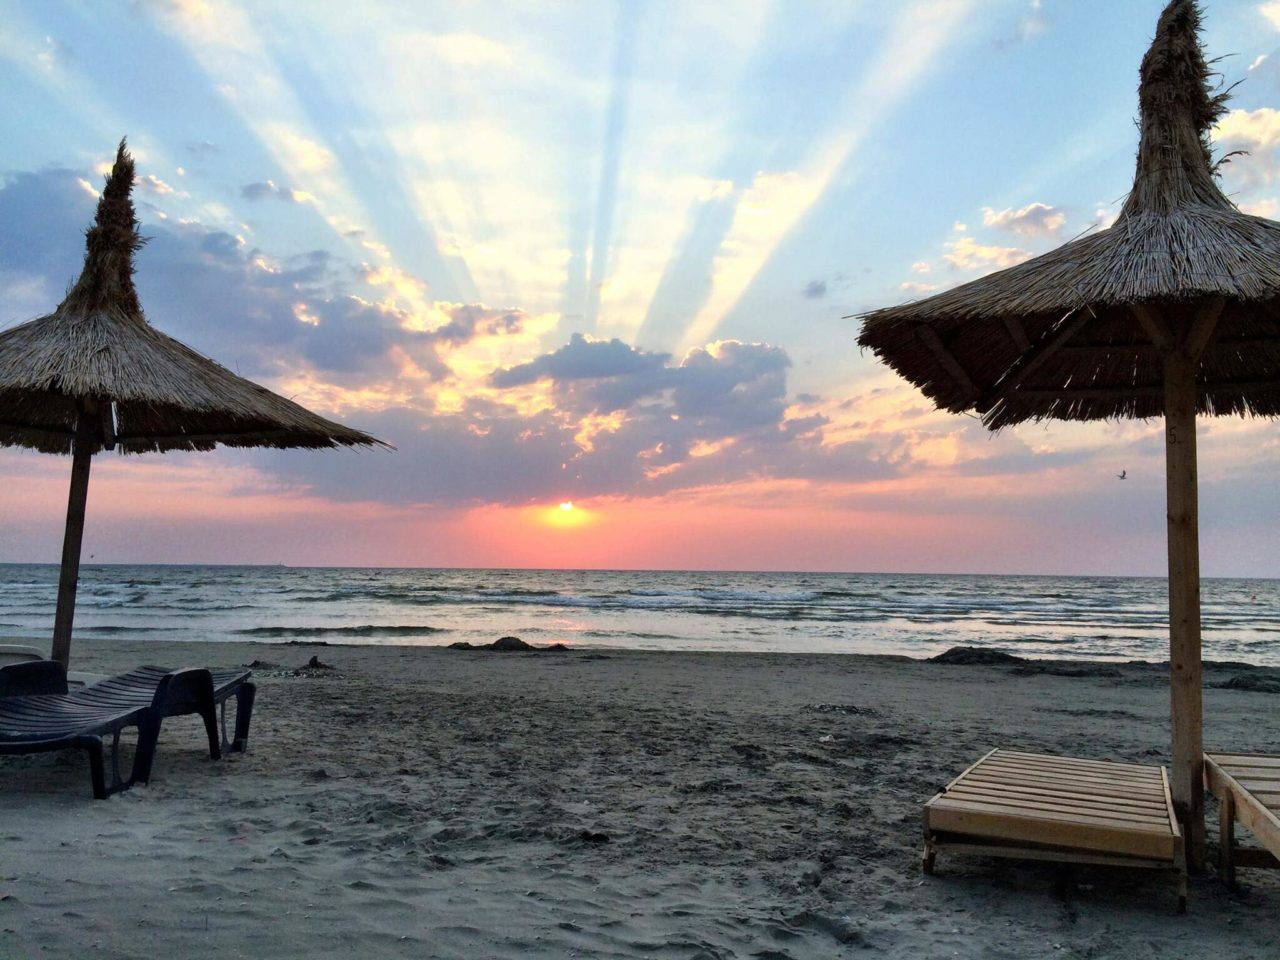 vedere la malul mării)